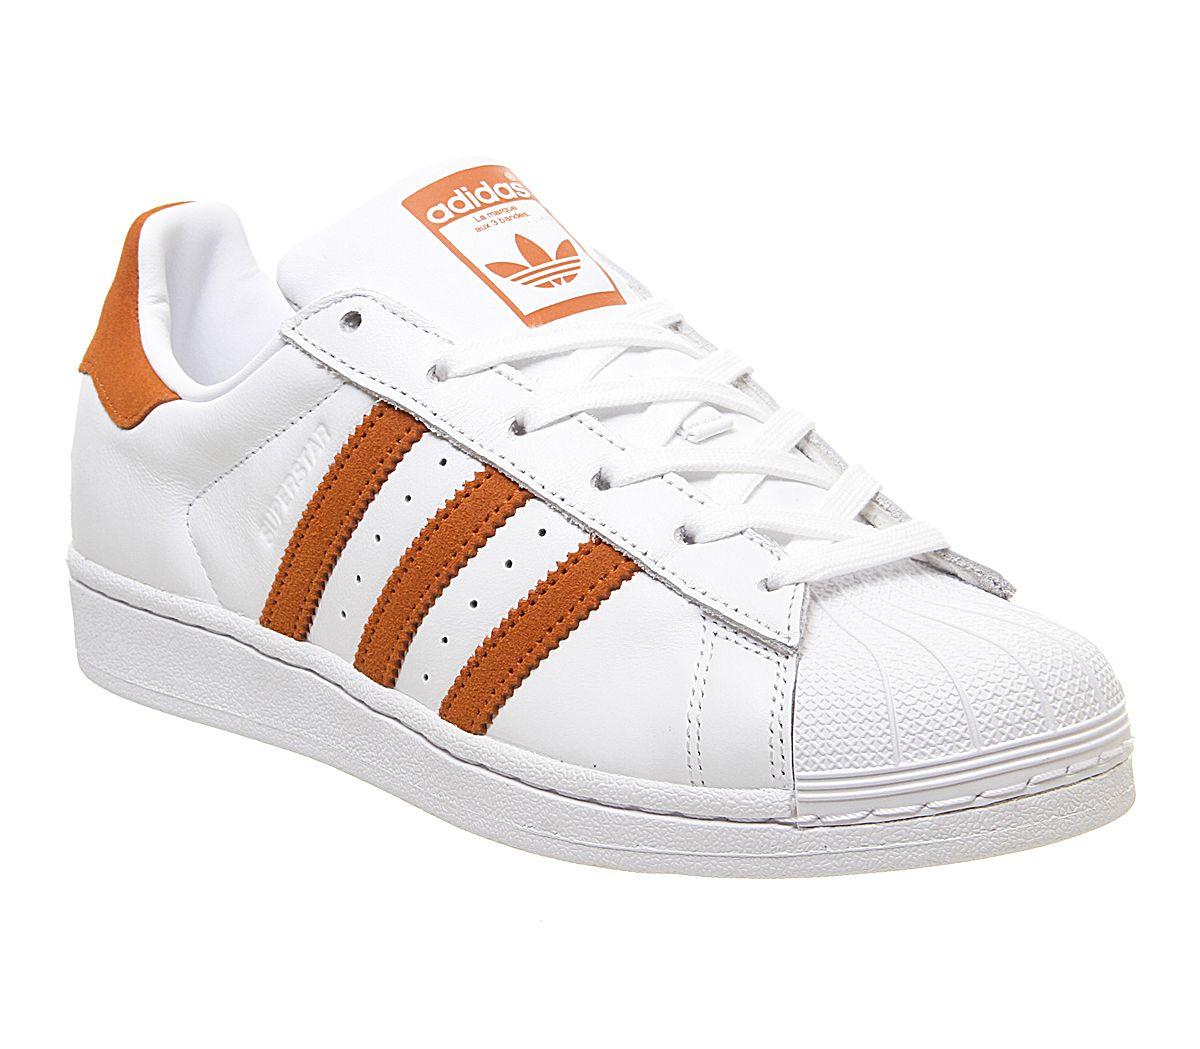 Détails sur Hommes Adidas Superstar 1 Baskets Blanc Orange Baskets